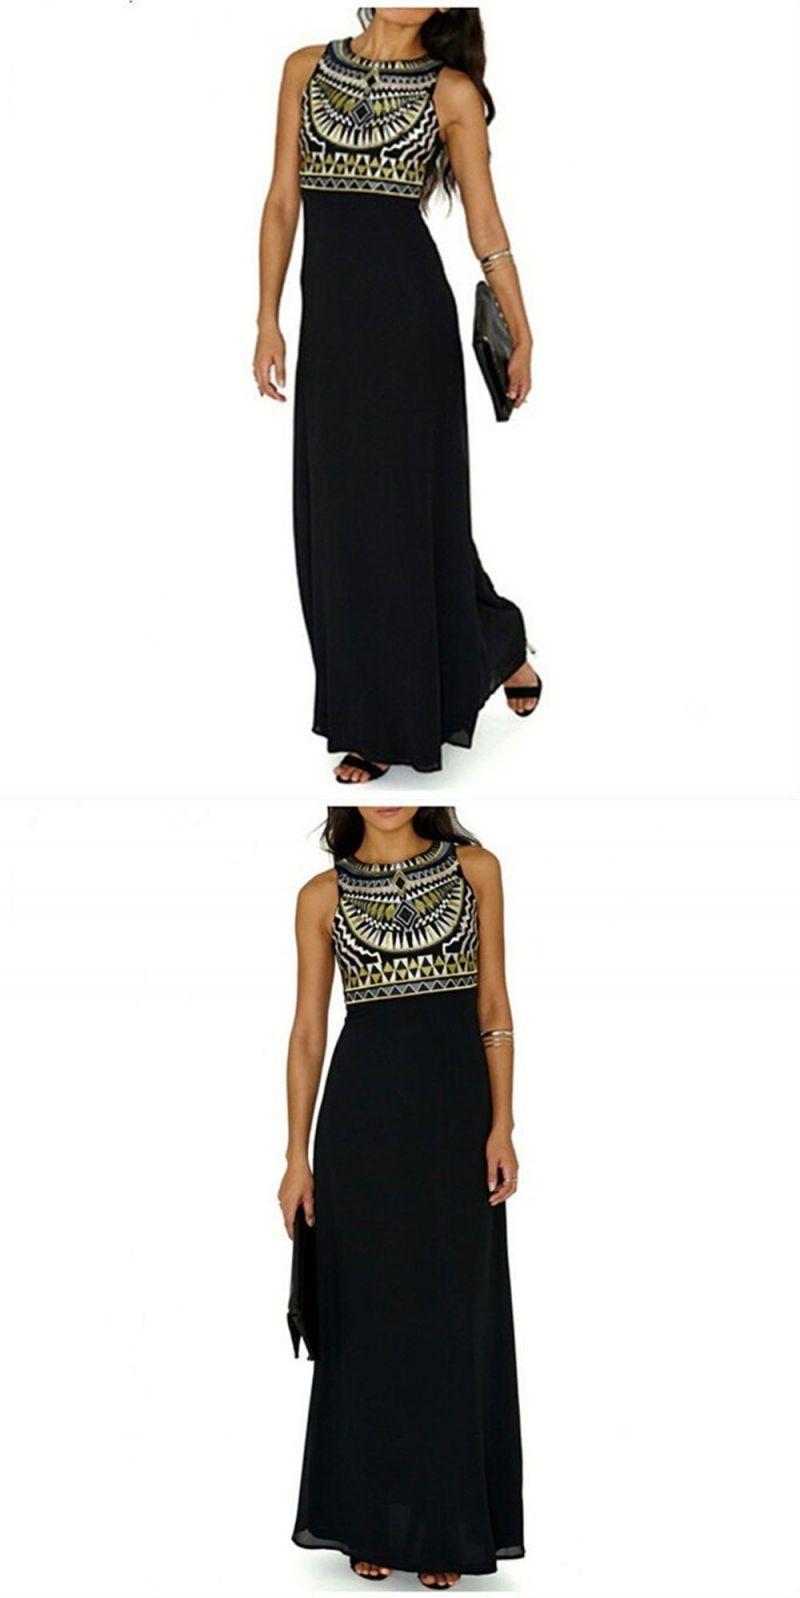 711953ae72 Women's summer boho dress floral print strapless vintage dresses long maxi  evening party beach dress chiffon